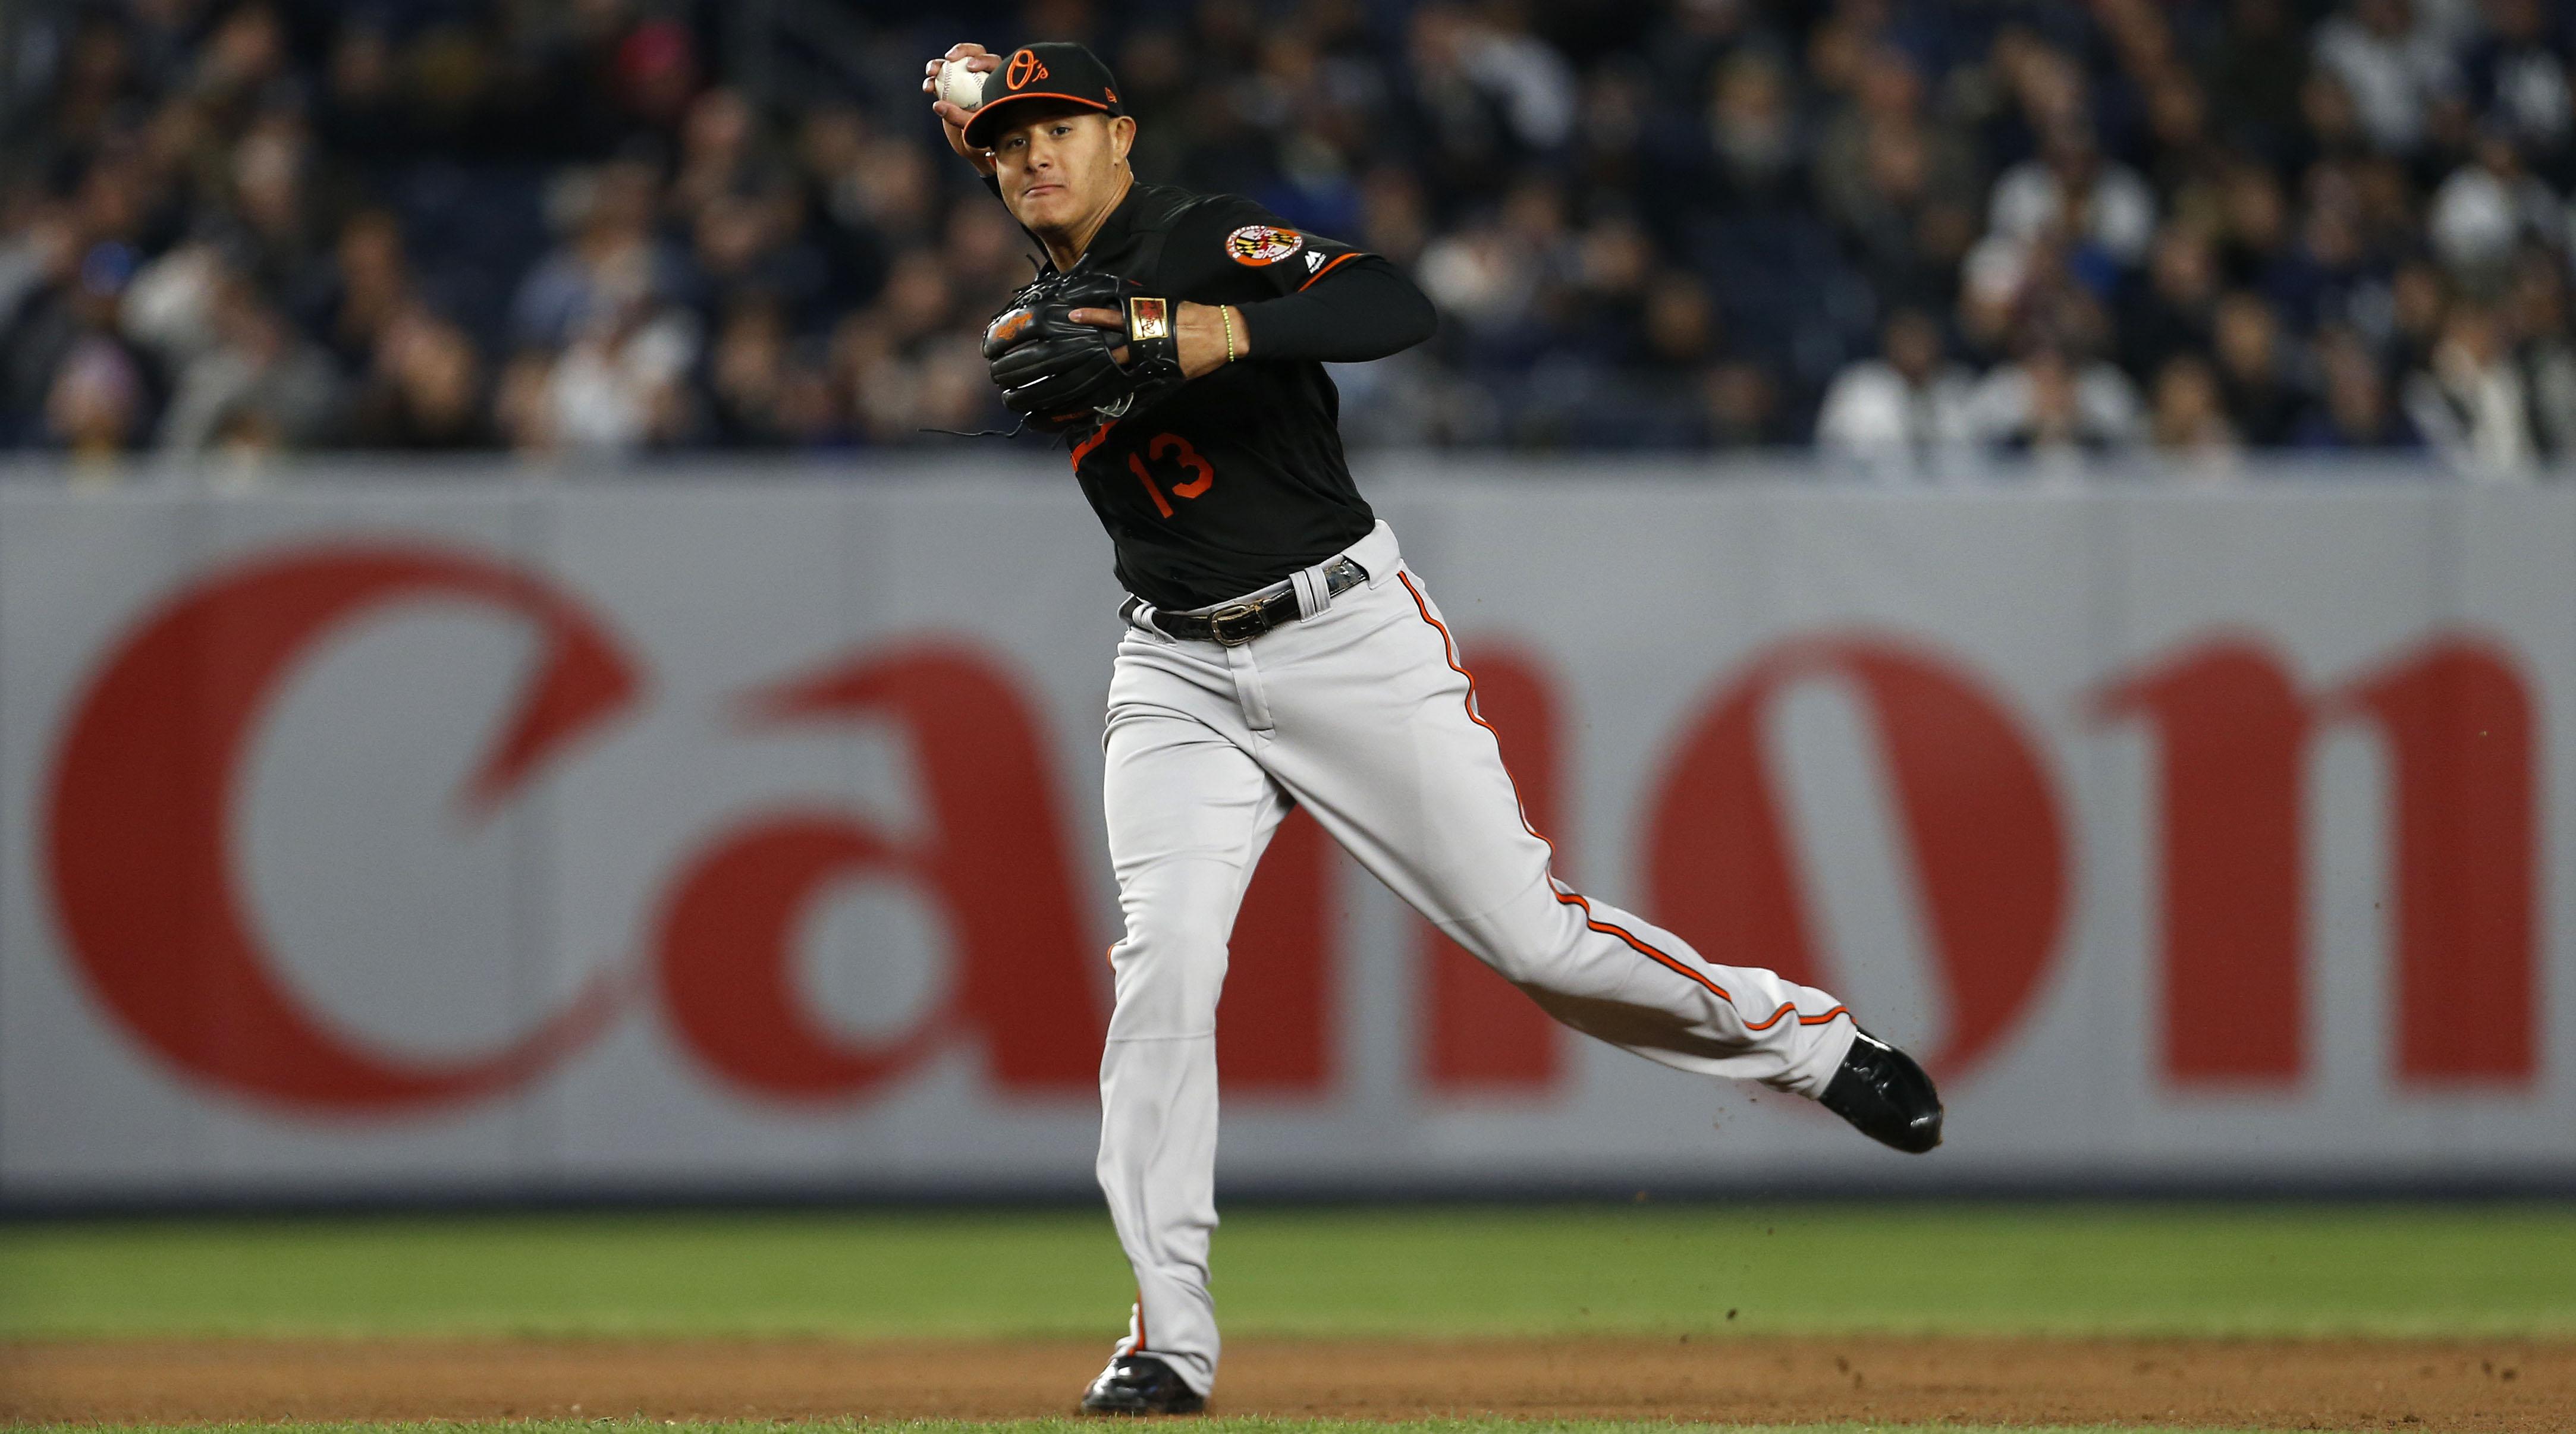 Manny-machado-yankees-potential-trade-mlb-rumors